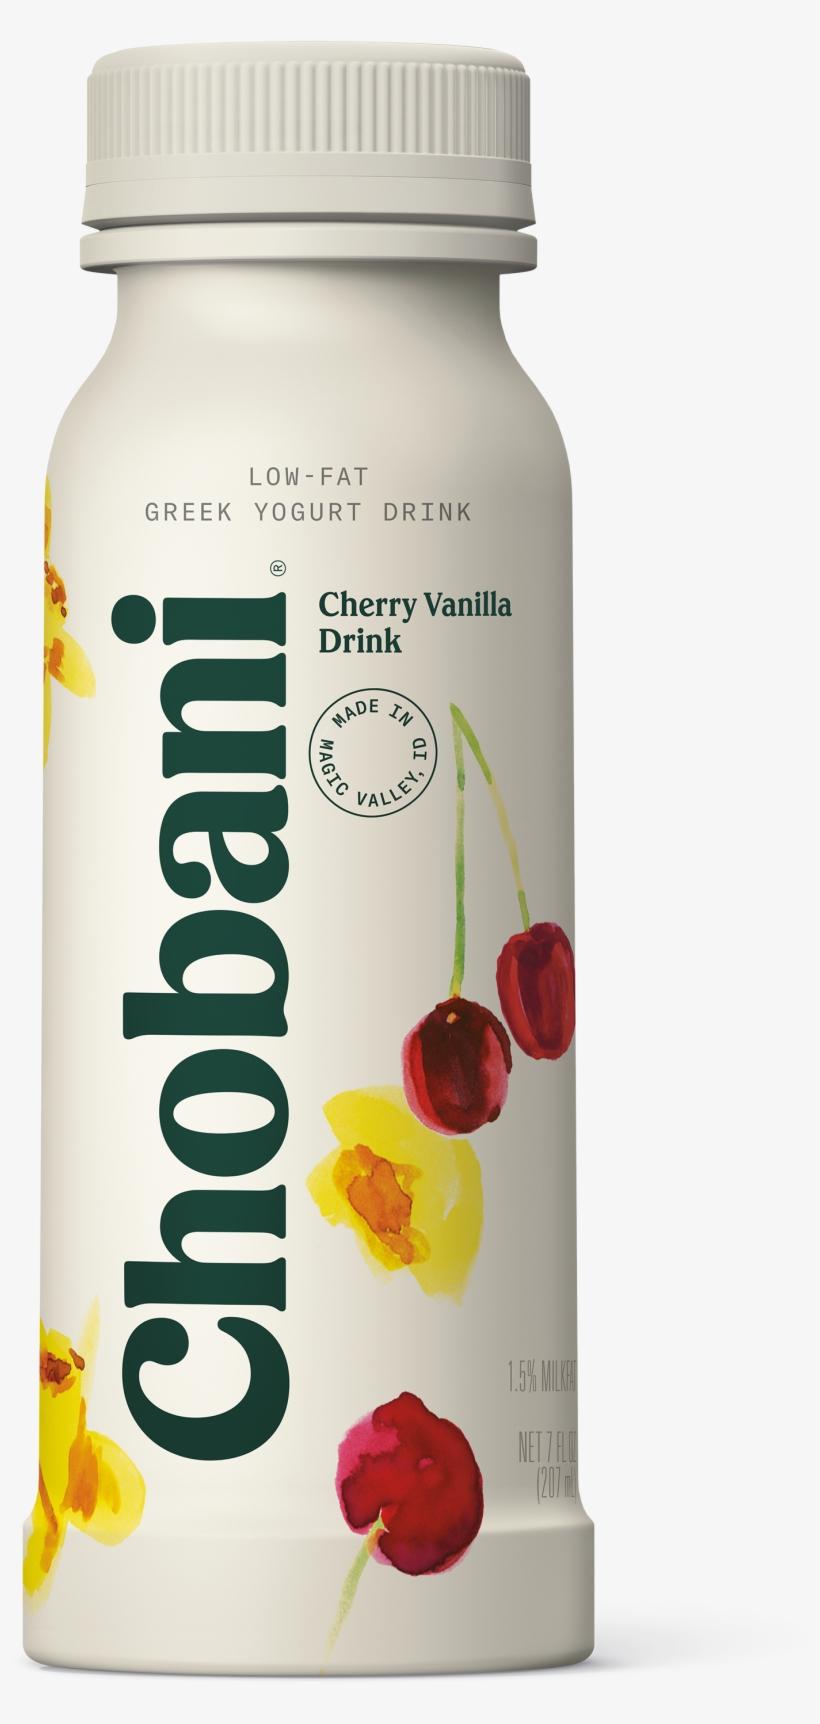 Chobani, Cherry Vanilla Low Fat Greek Yogurt Drink, - Chobani Greek Yogurt Drink Strawberry Banana, transparent png #3774028